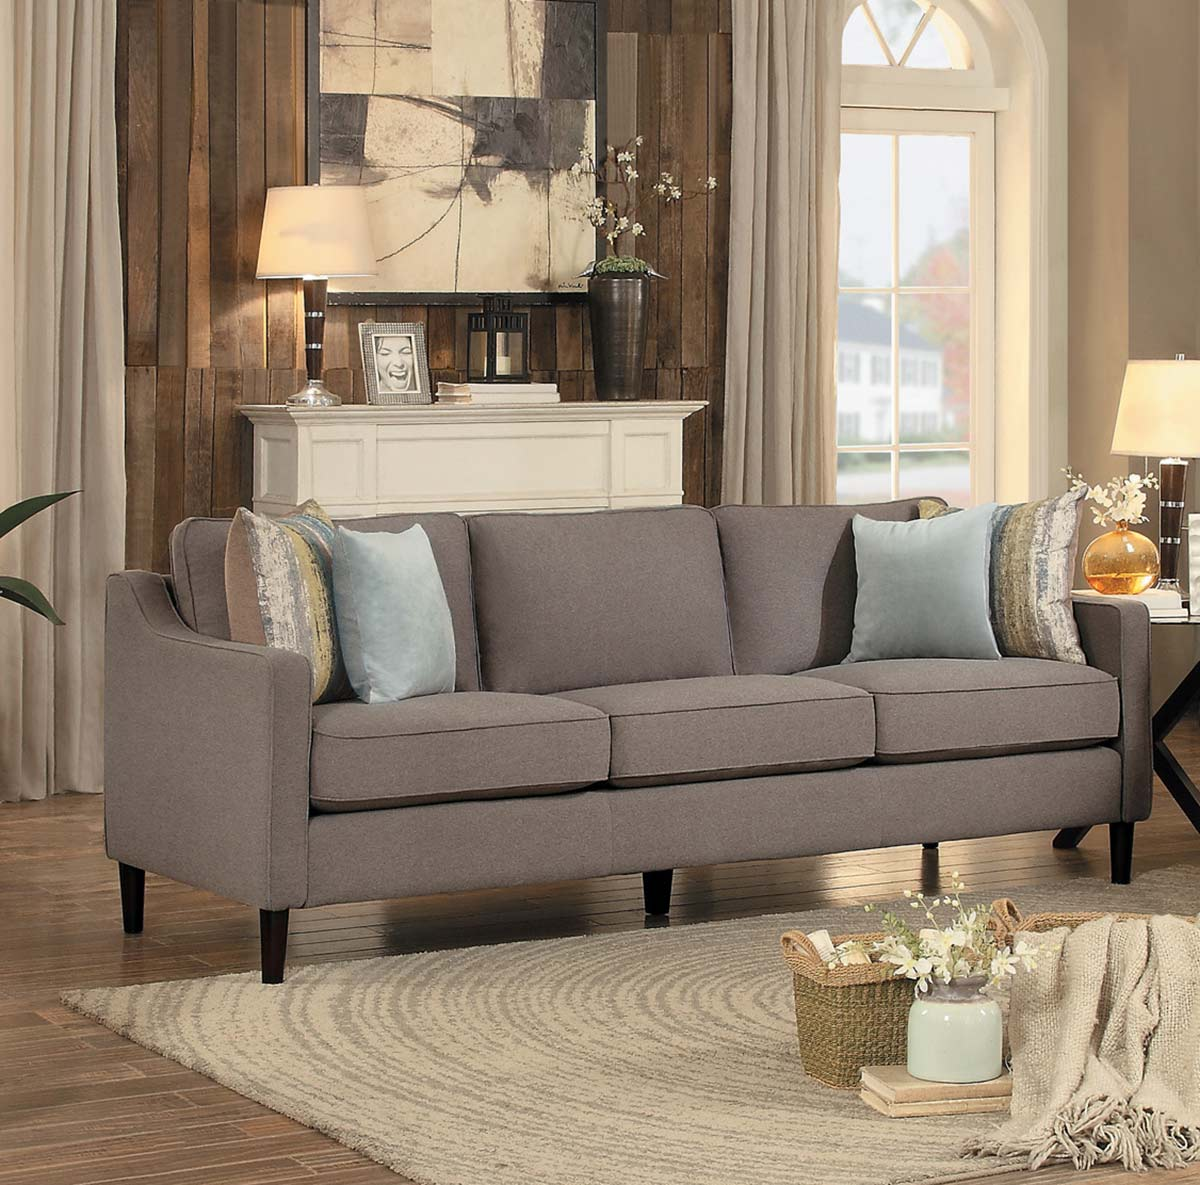 Homelegance Lotte Sofa - Brown Fabric